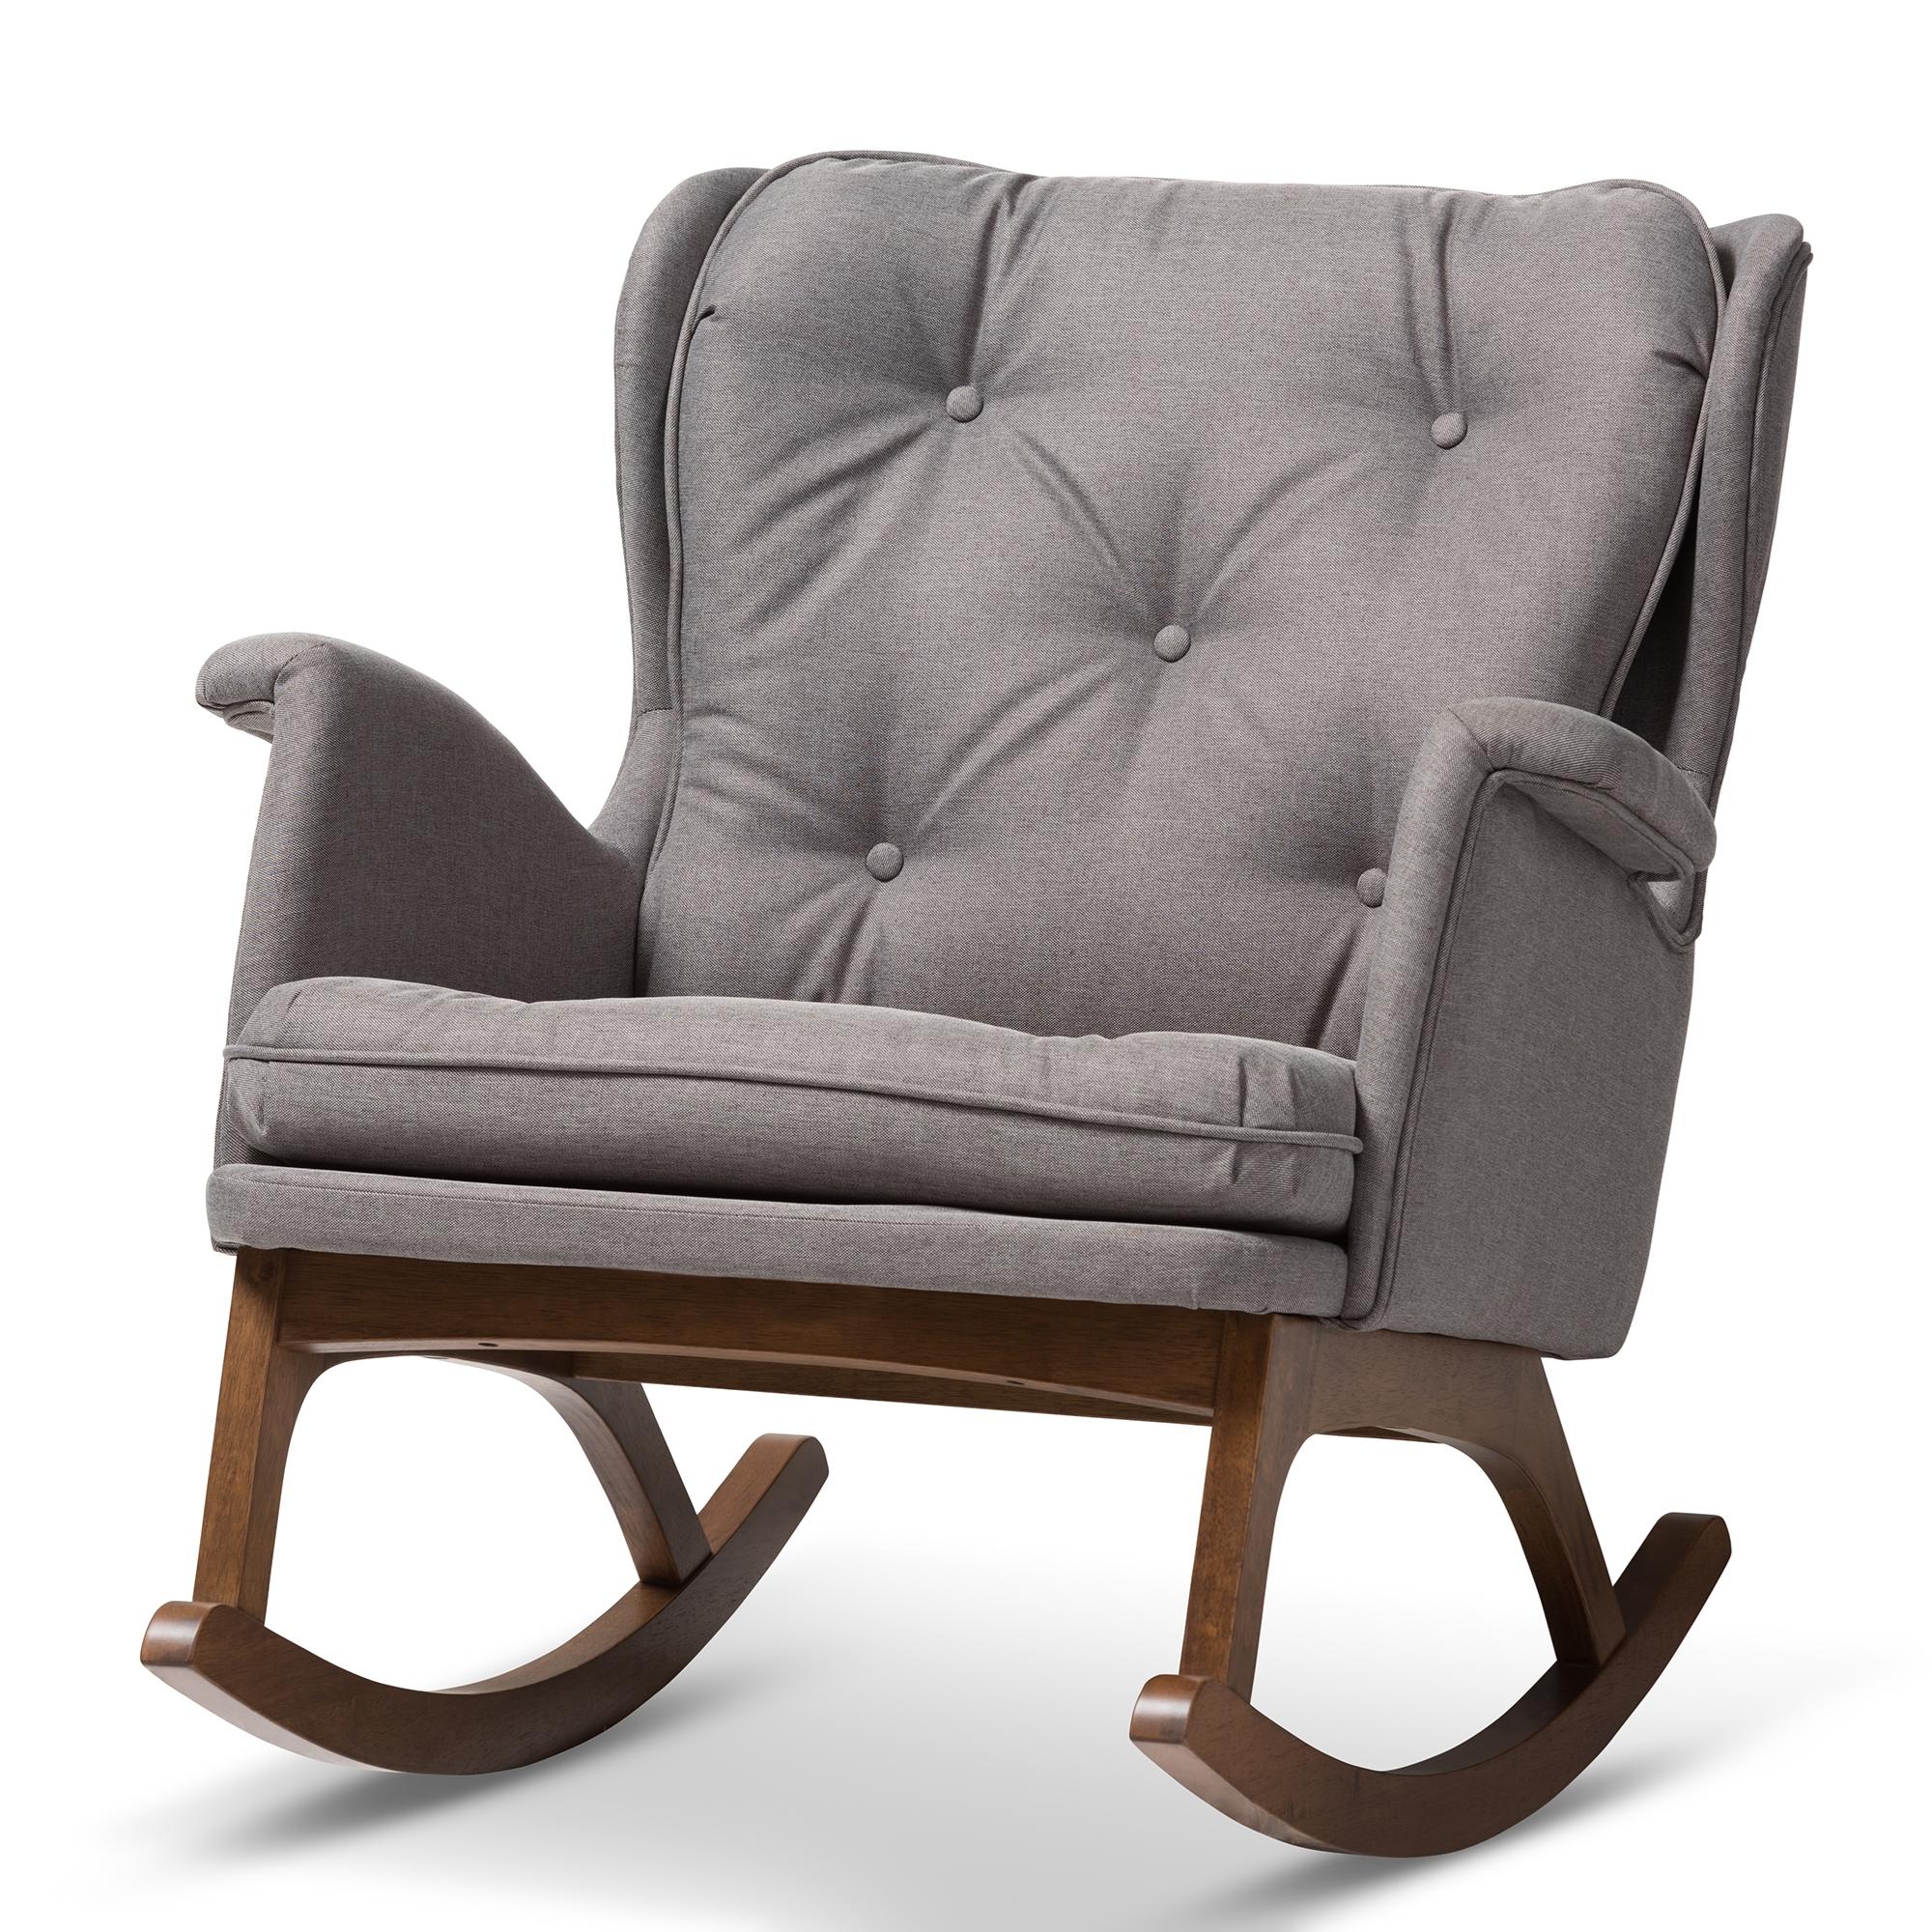 Baxton Studio Maggie Mid Century Modern Grey Fabric Upholstered  Walnut Finished Rocking Chair